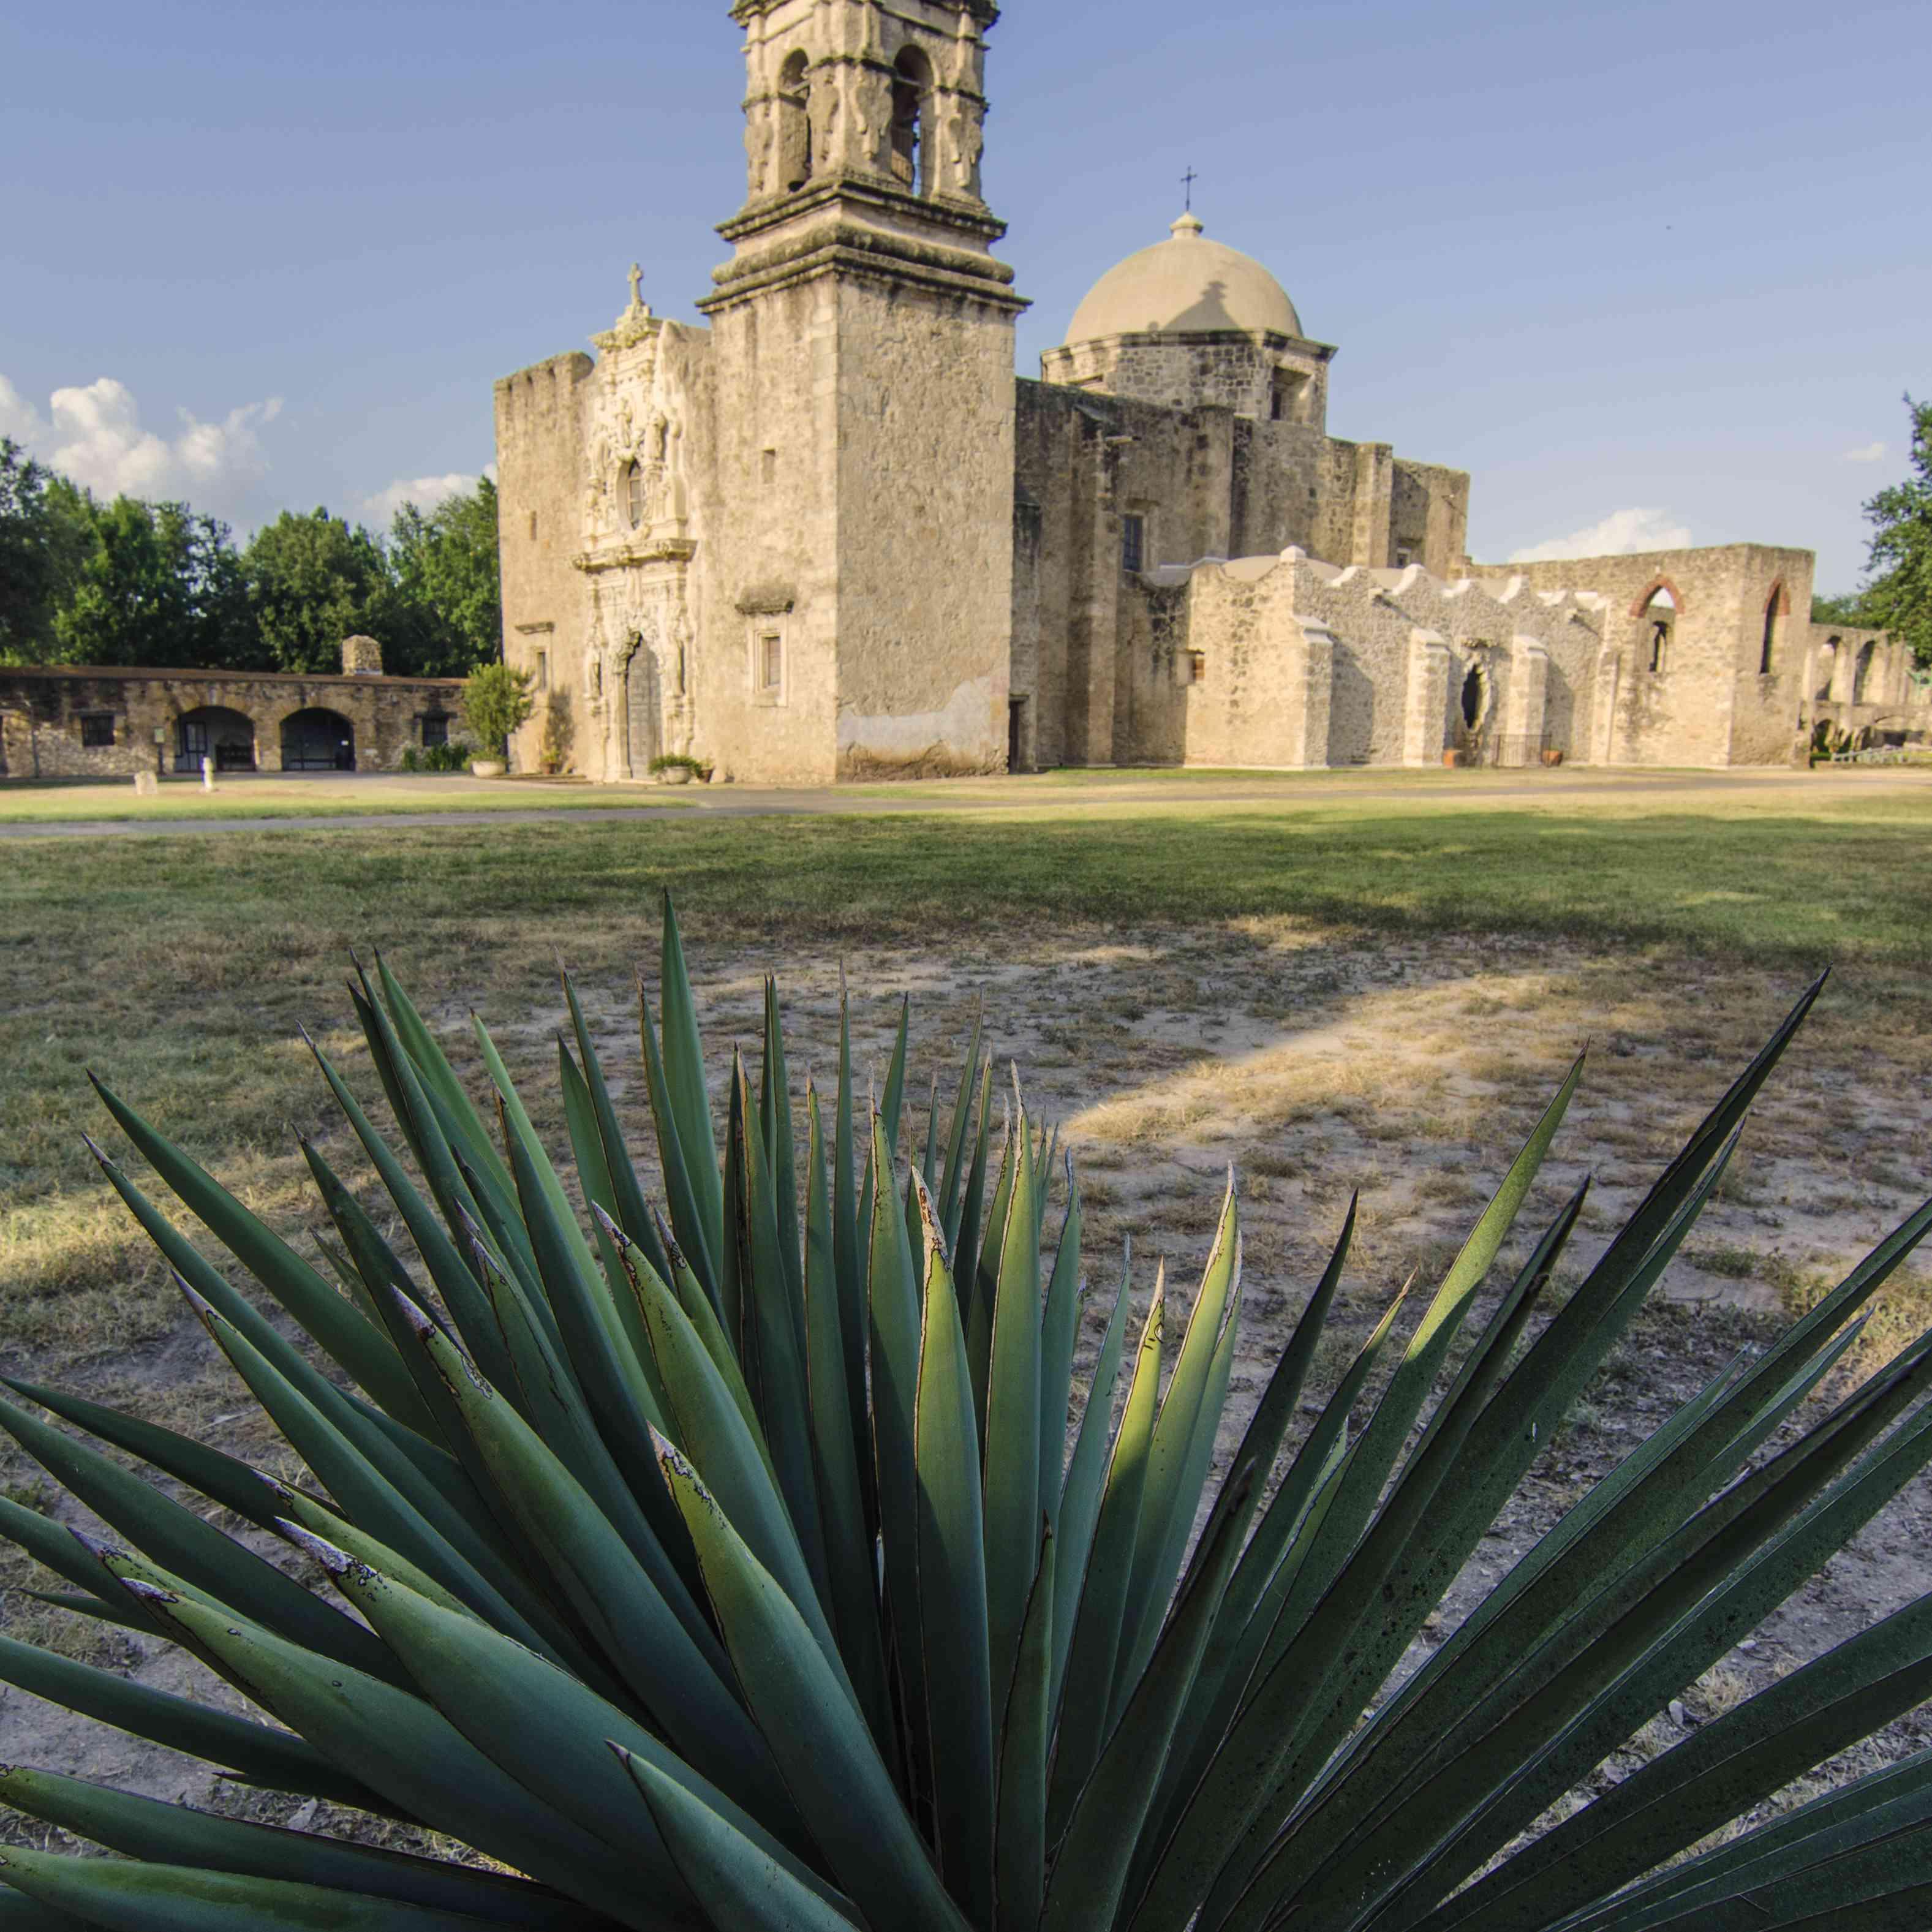 Mission San Jose: A UNESCO World Heritage Site